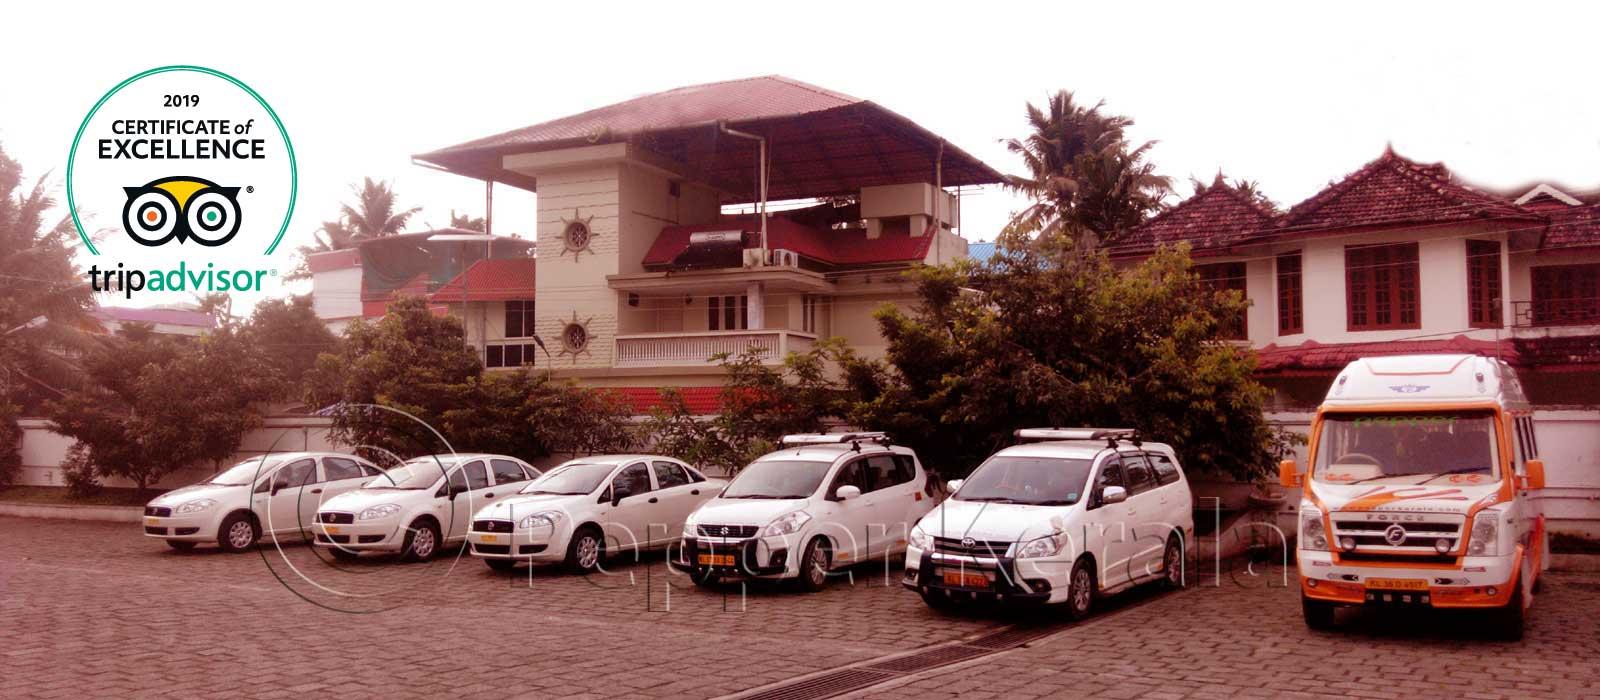 Travels in Cochin-Kerala Taxi Packages-Kochi Car rentals